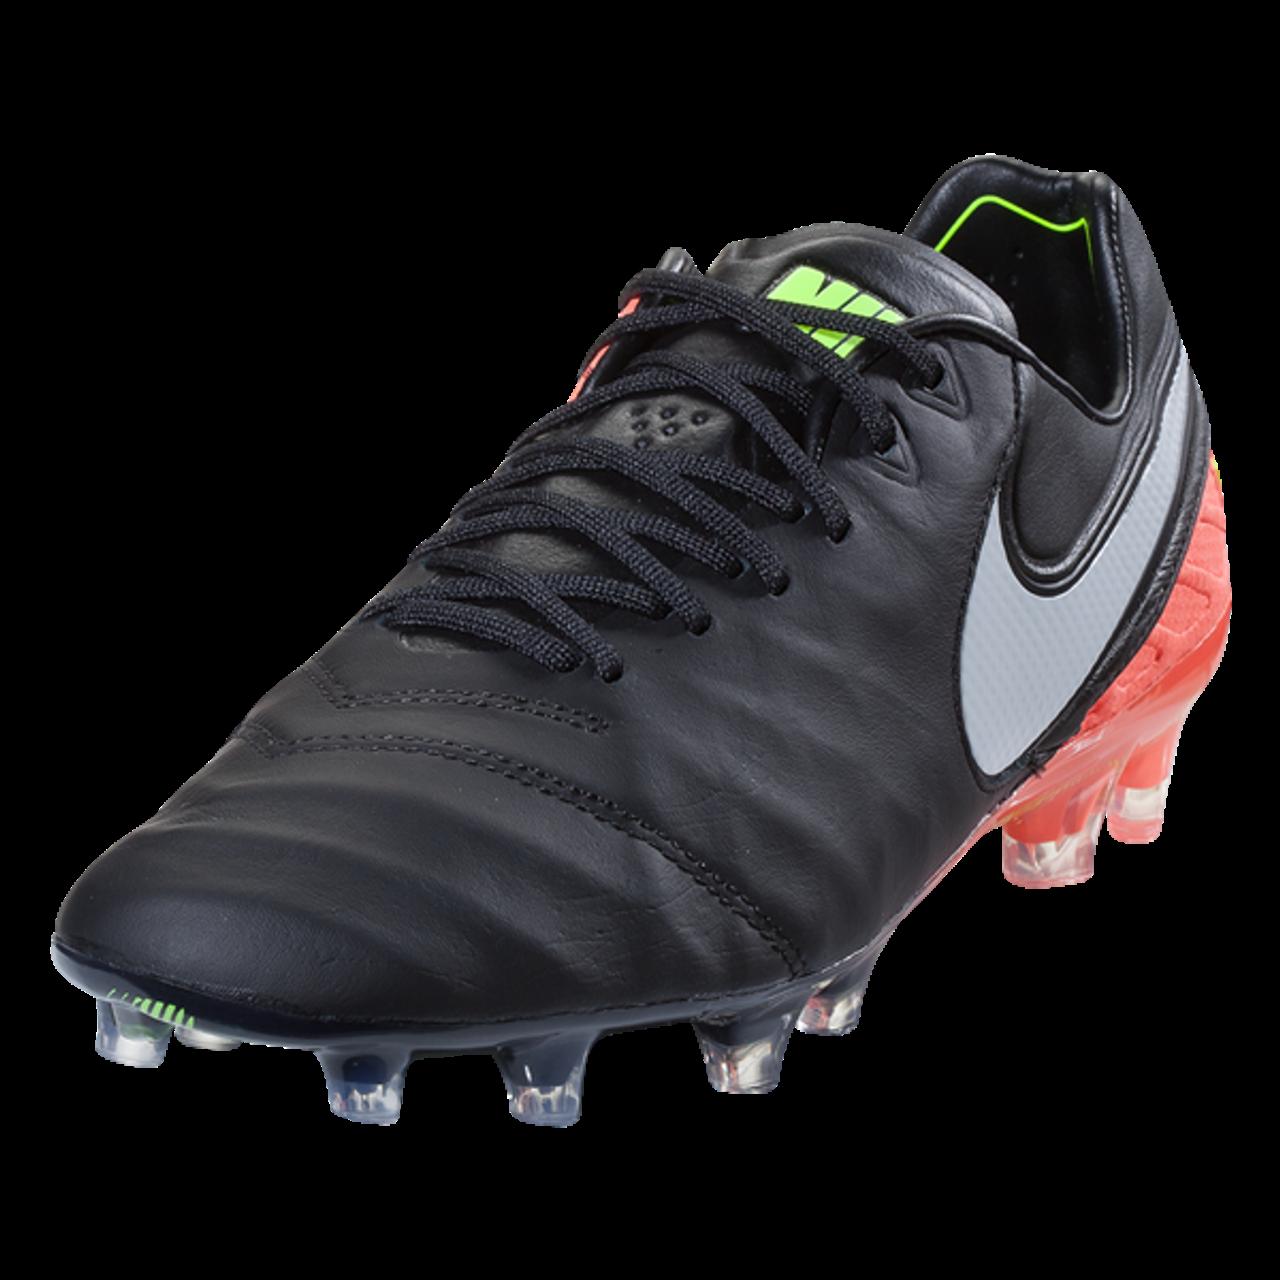 6791d3341 Nike Tiempo Legend VI FG - Black White Hyper Orange Volt RC (031419) - ohp  soccer